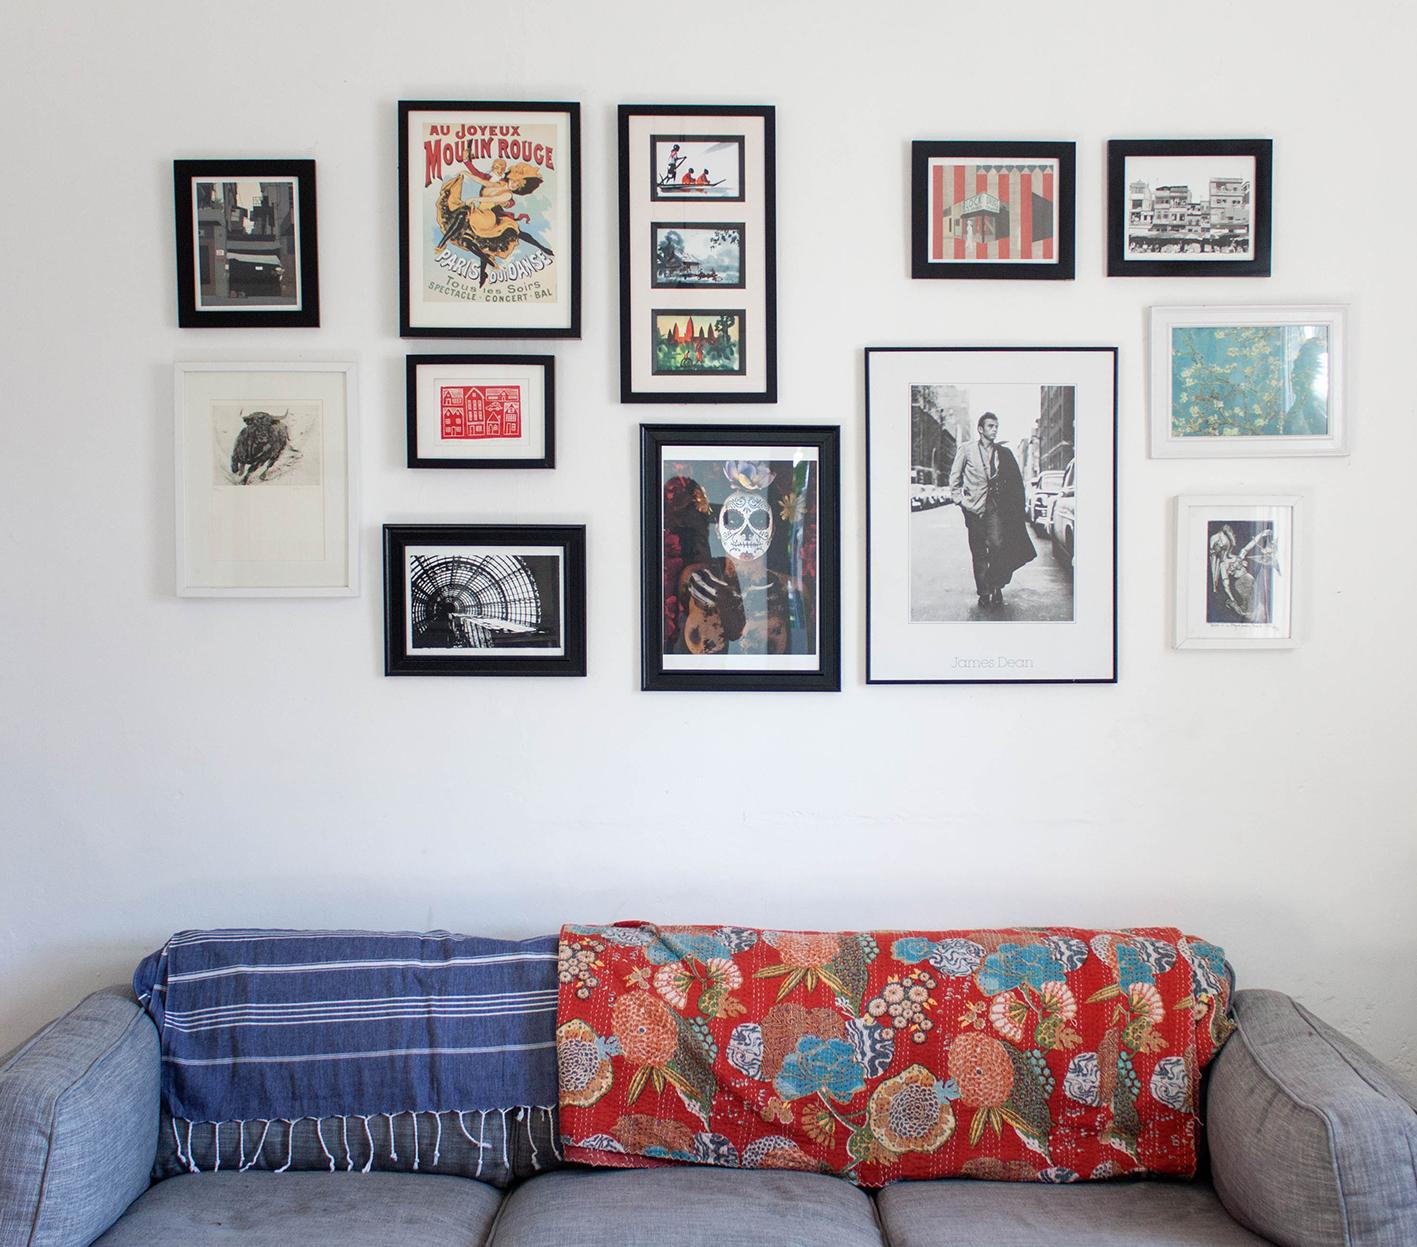 Australia artist Madeline Young studio visit